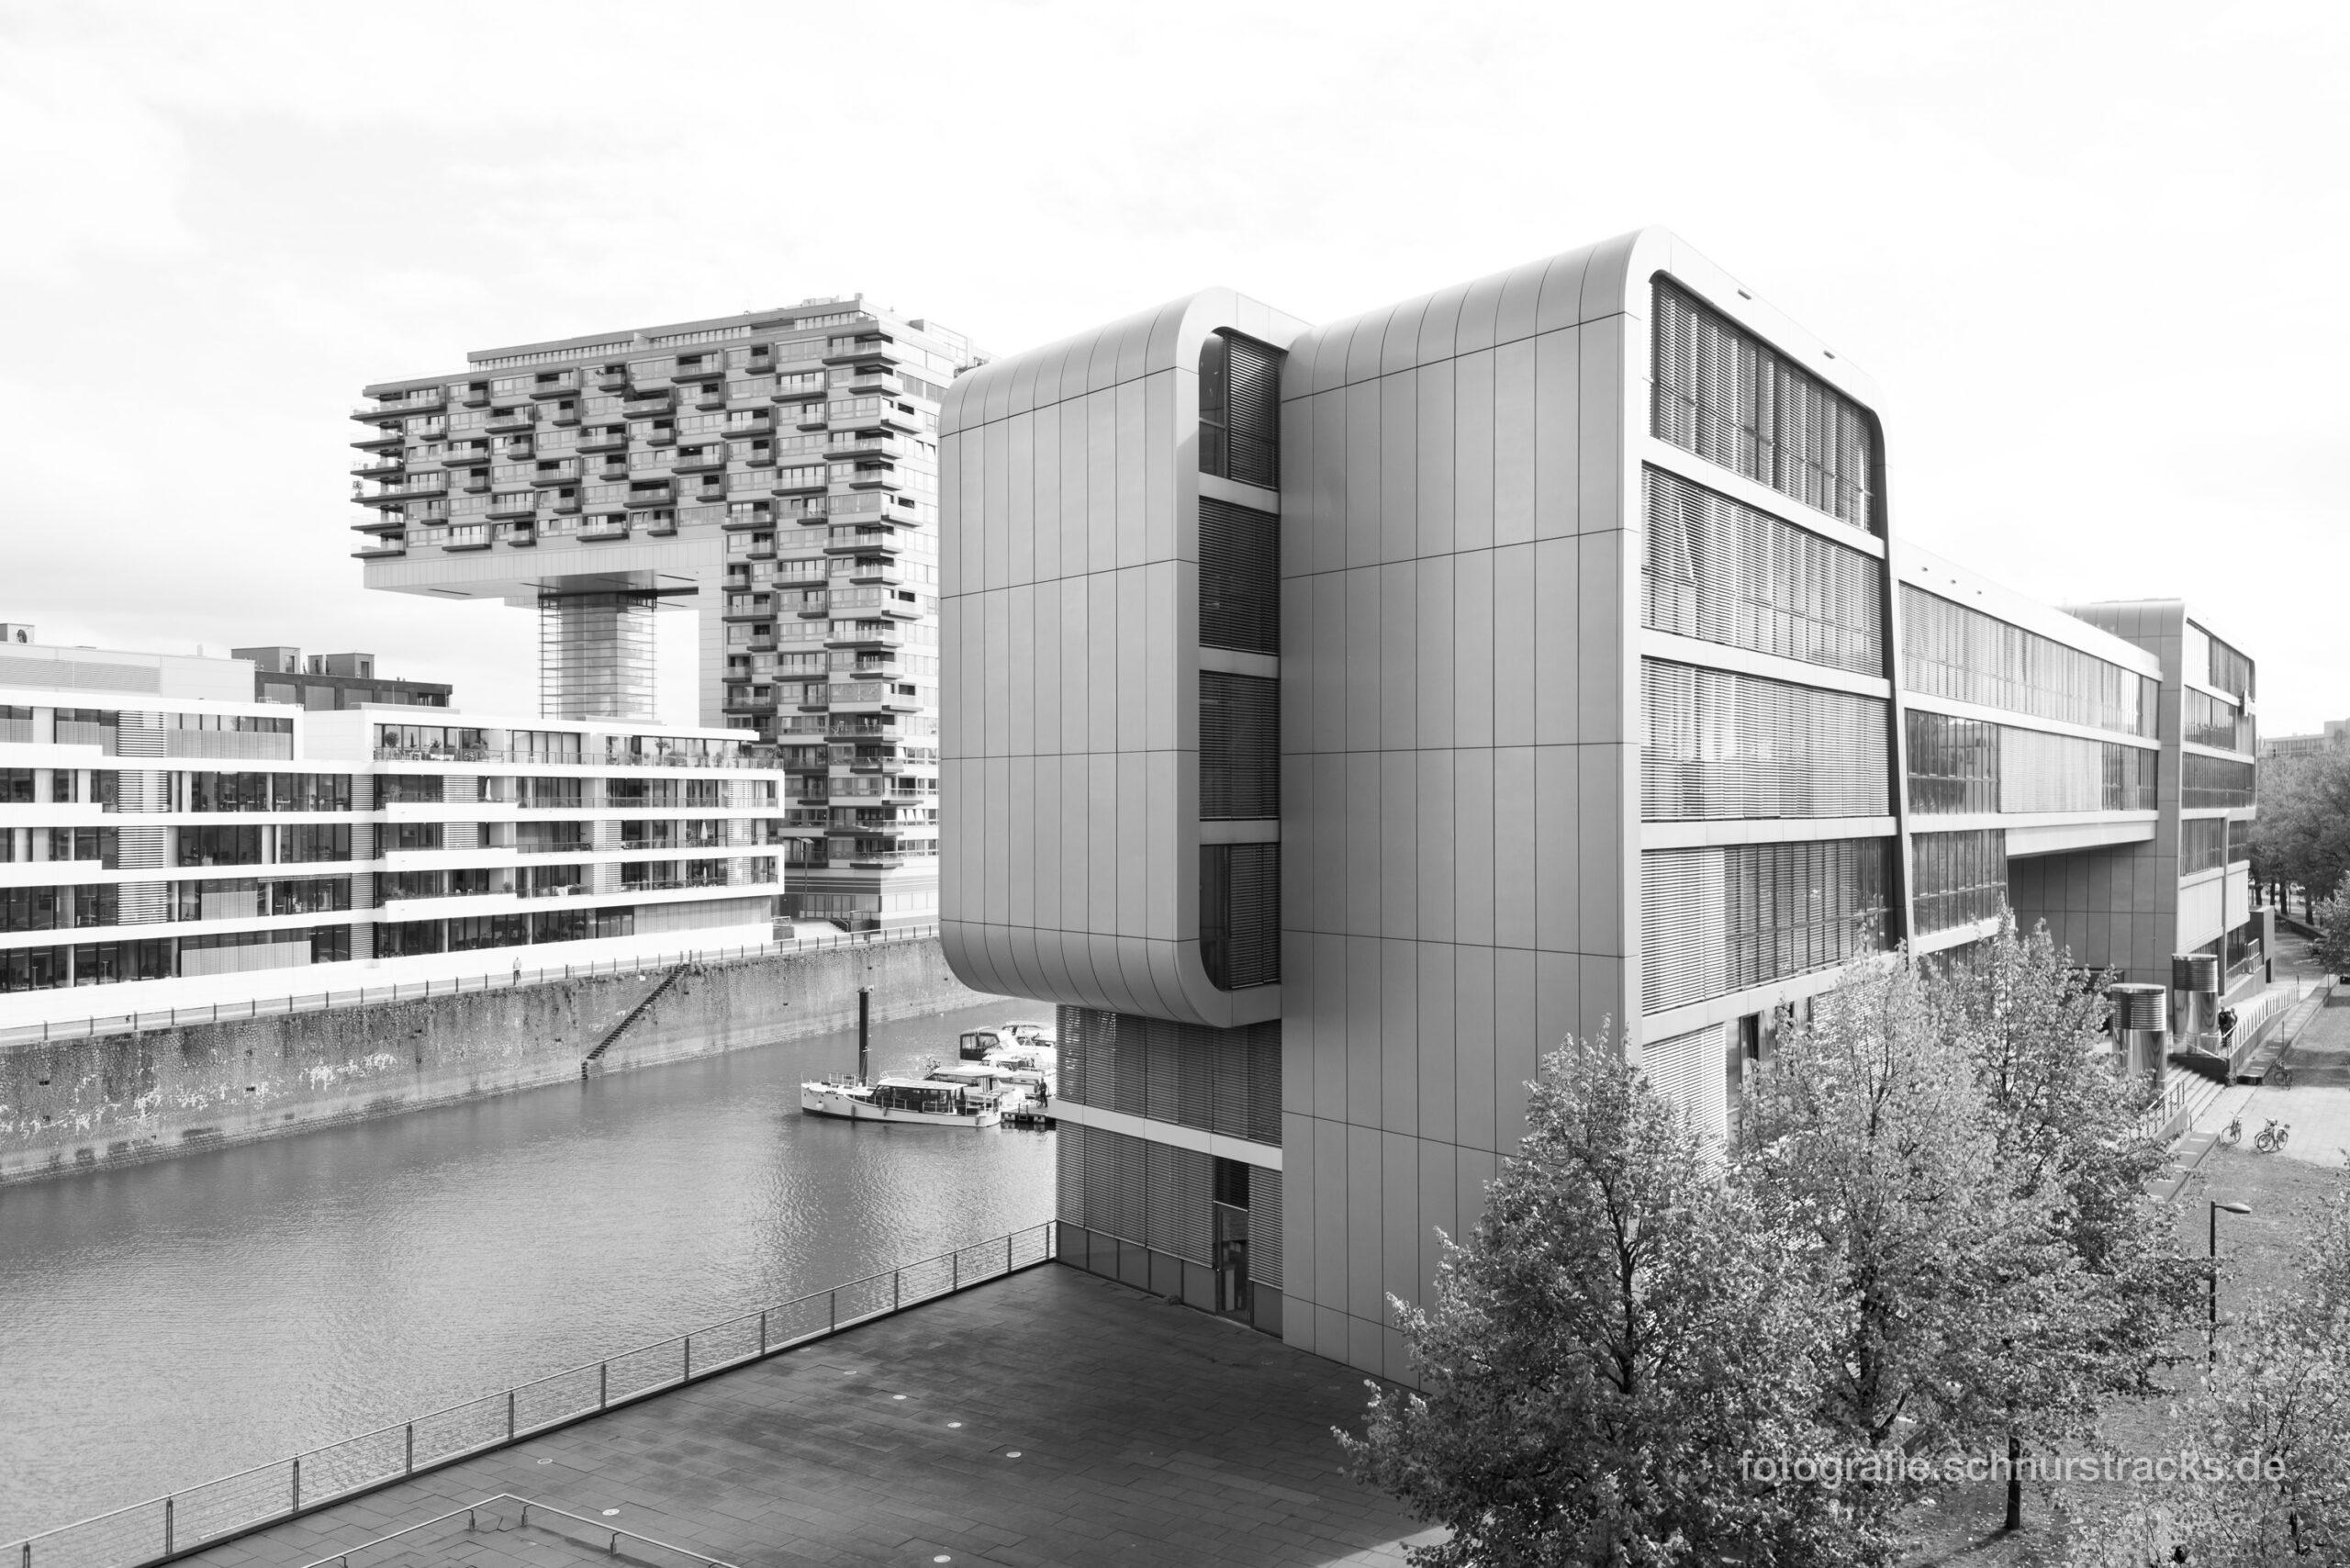 RheinauArtOffice